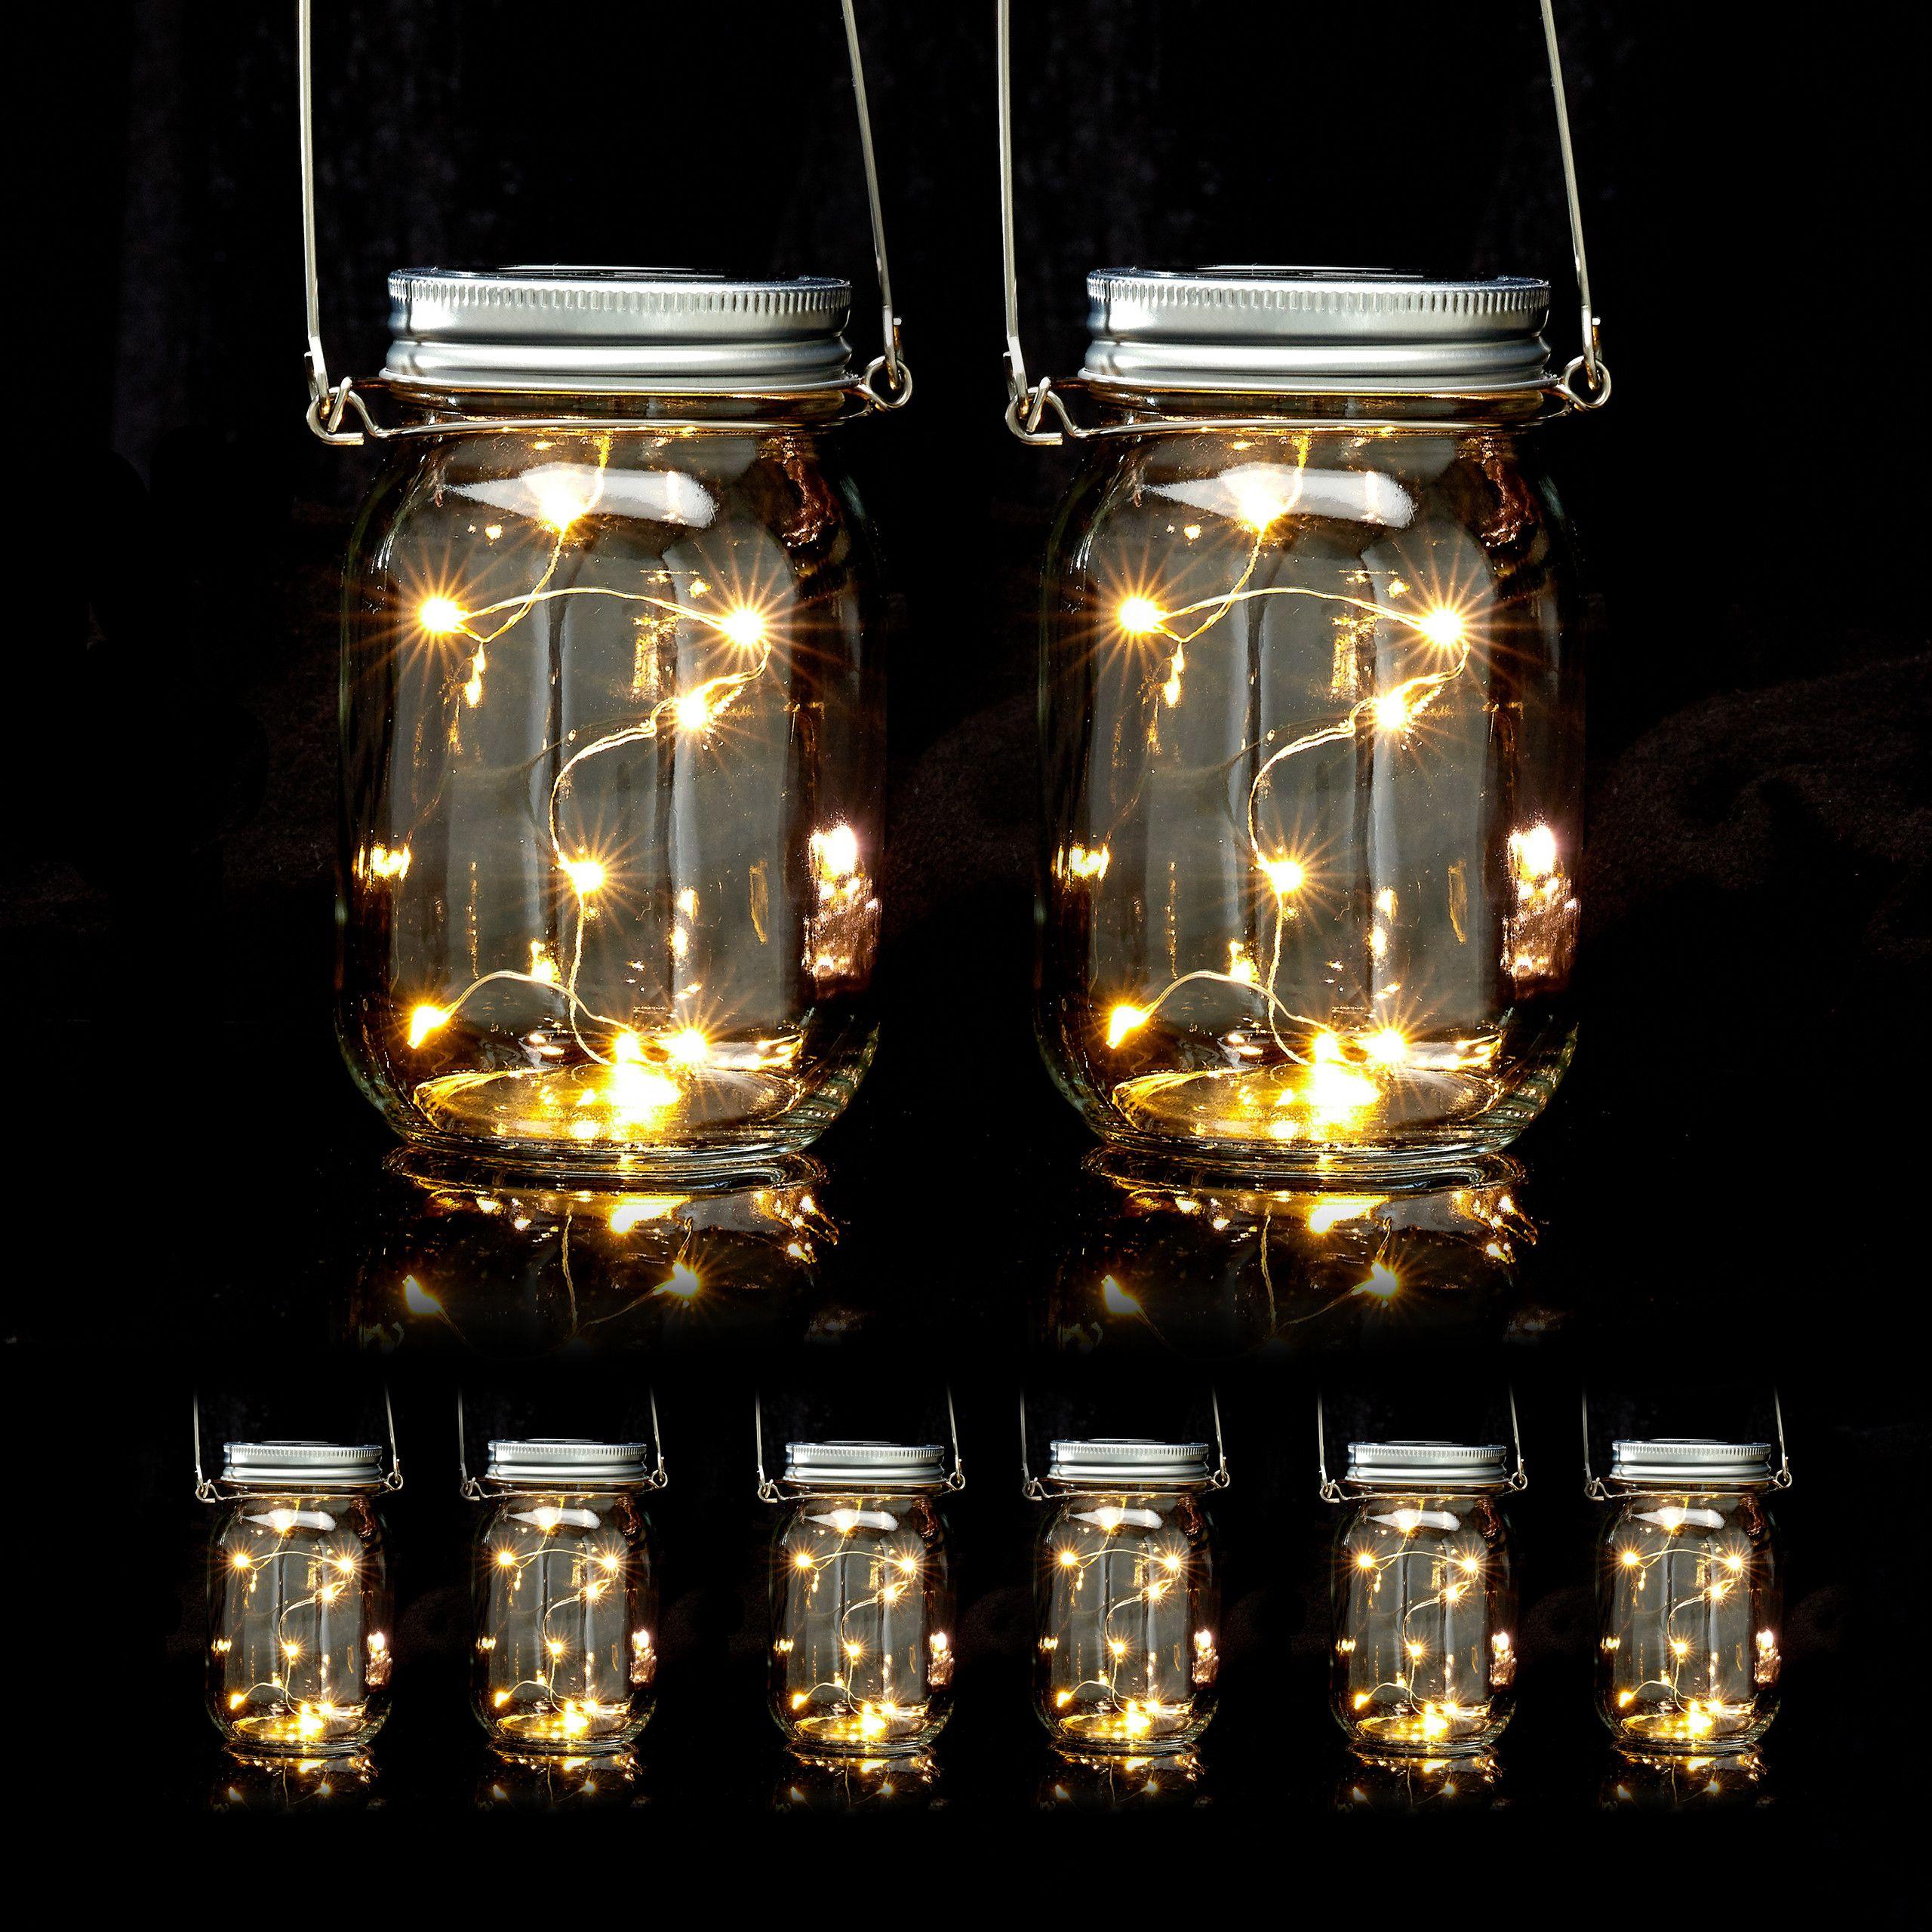 8 x LED Solar Glas